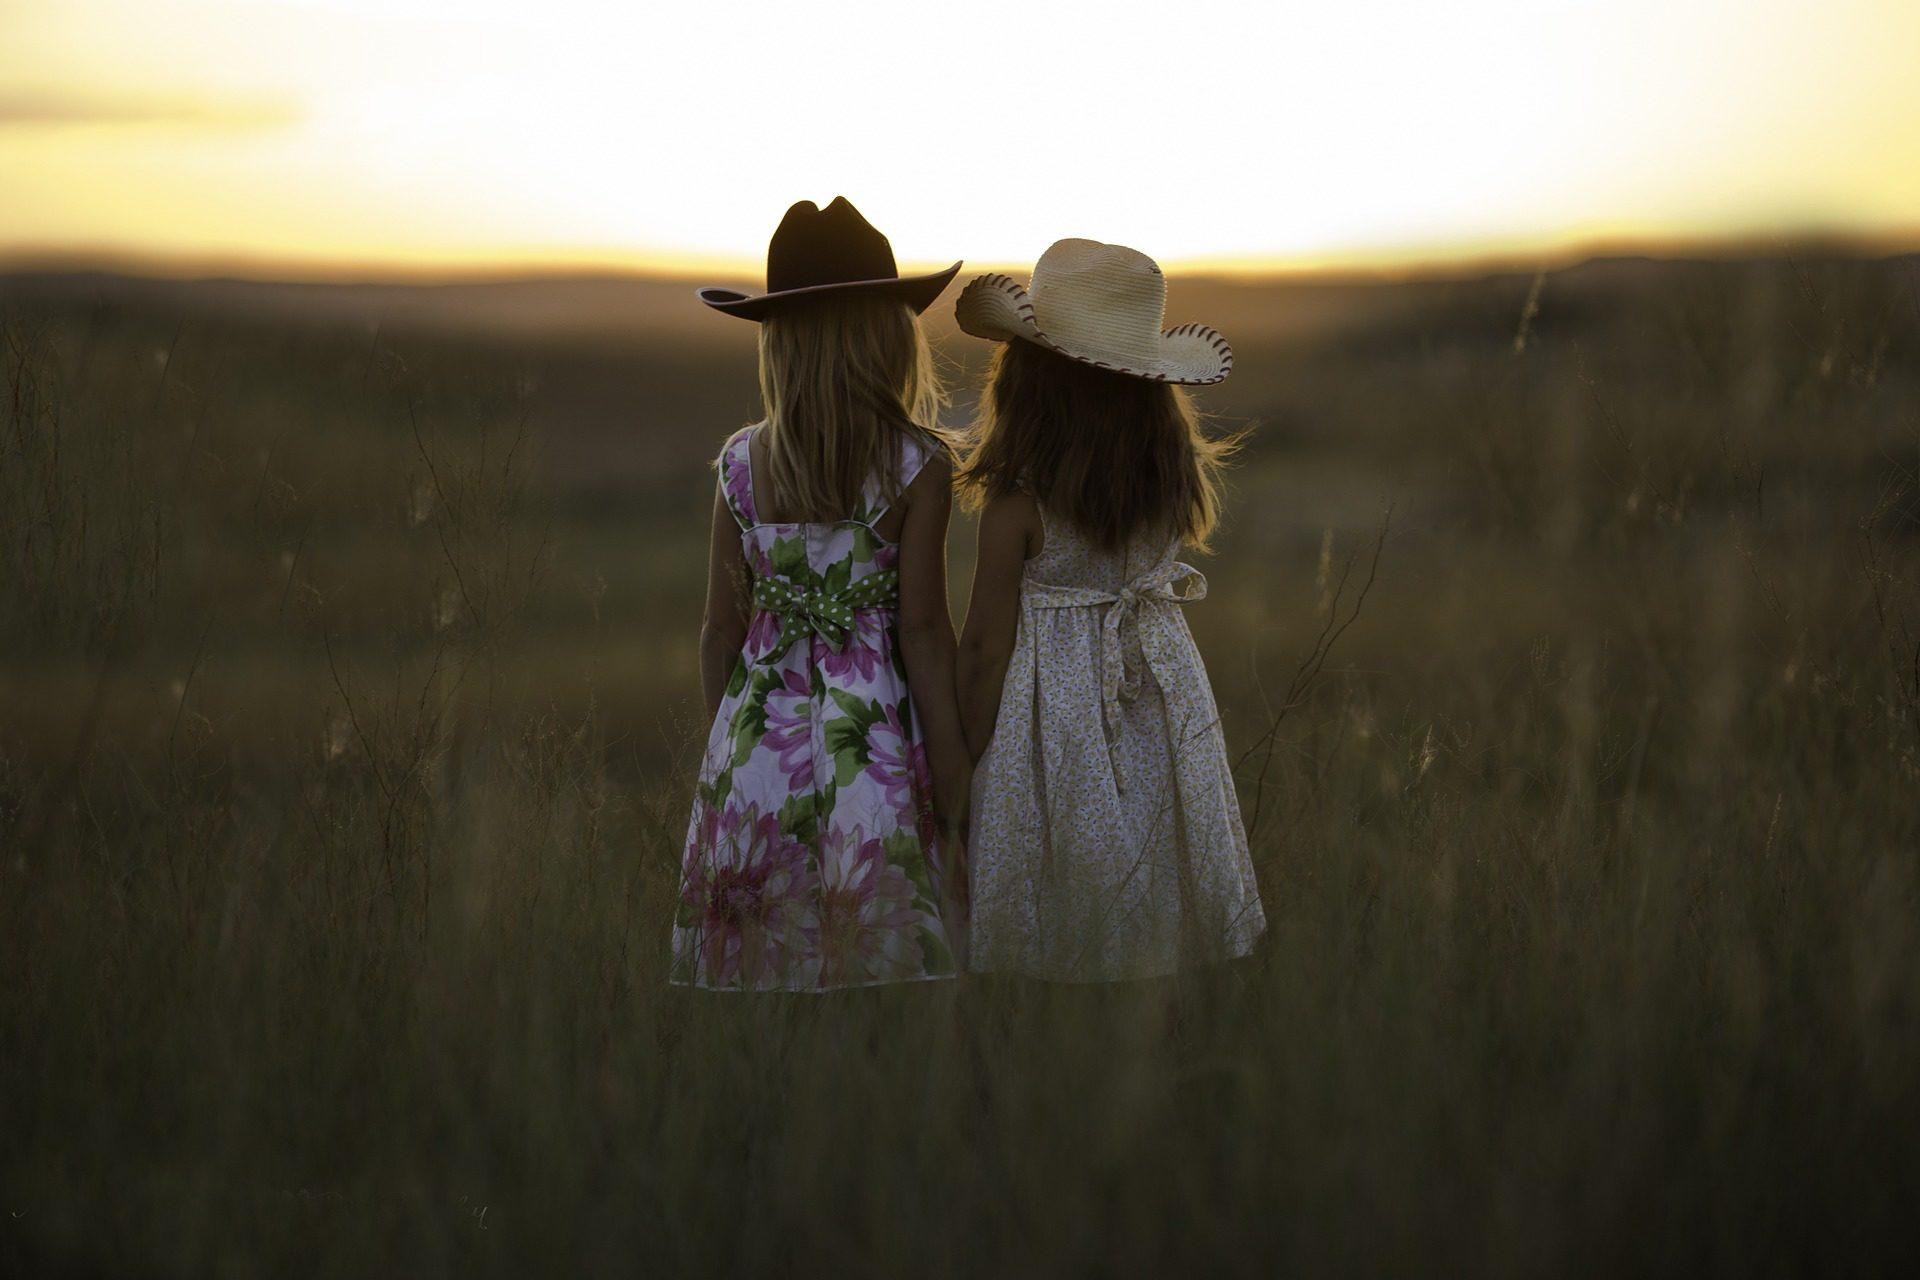 फ़ील्ड, PRADO, सूर्यास्त, लड़कियों, बचपन, टोपी, बहनों - HD वॉलपेपर - प्रोफेसर-falken.com